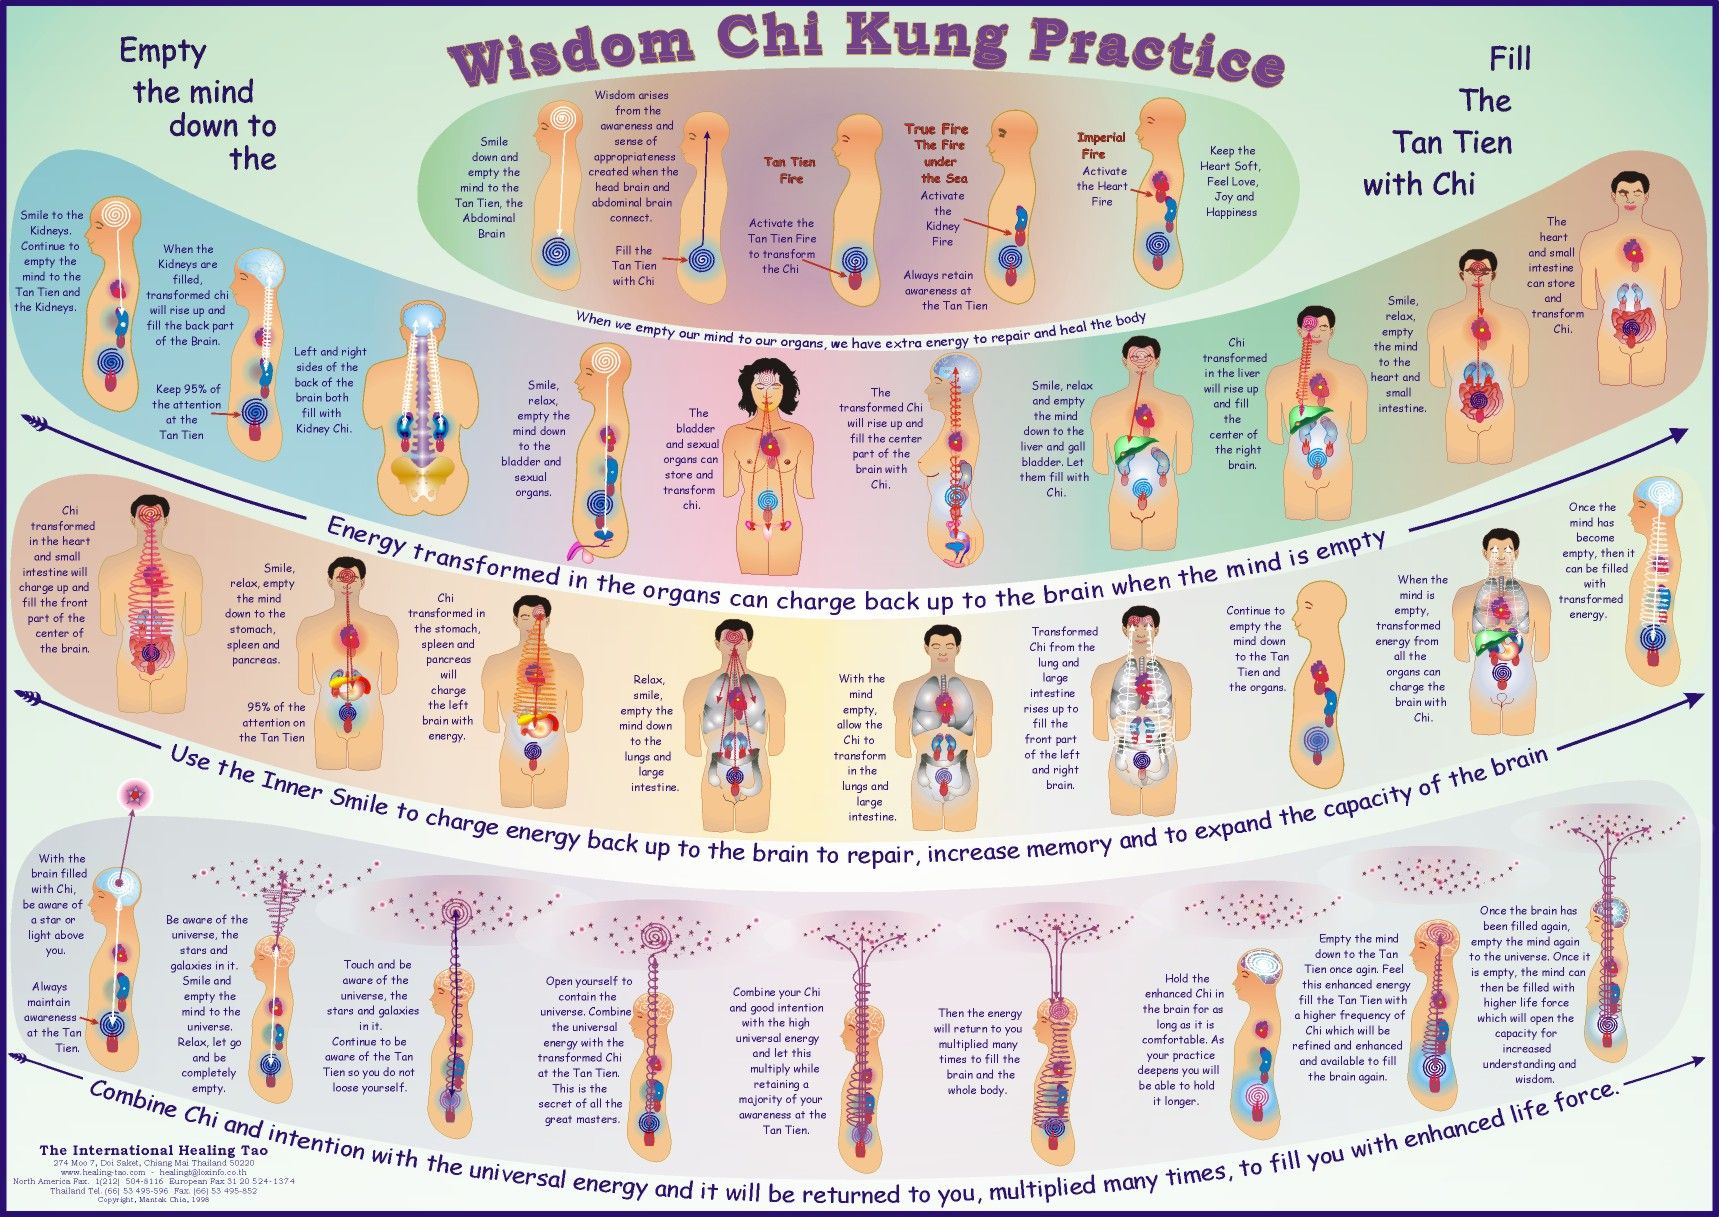 healing tao poster | Chi kung, Qigong, Simply energy